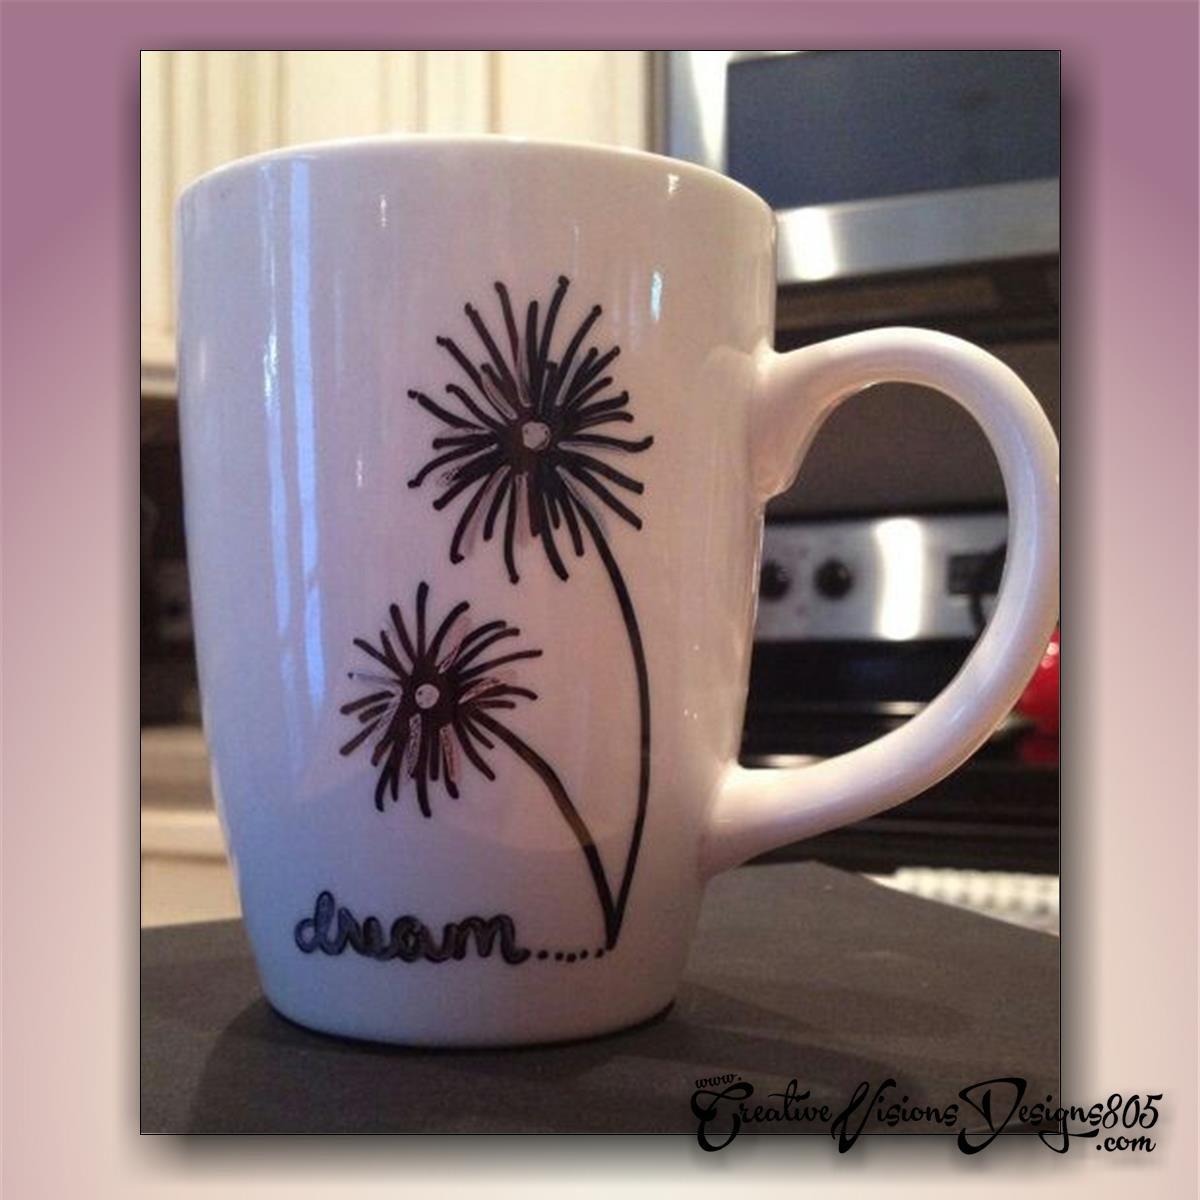 DANDILION - hand decorated coffee mug